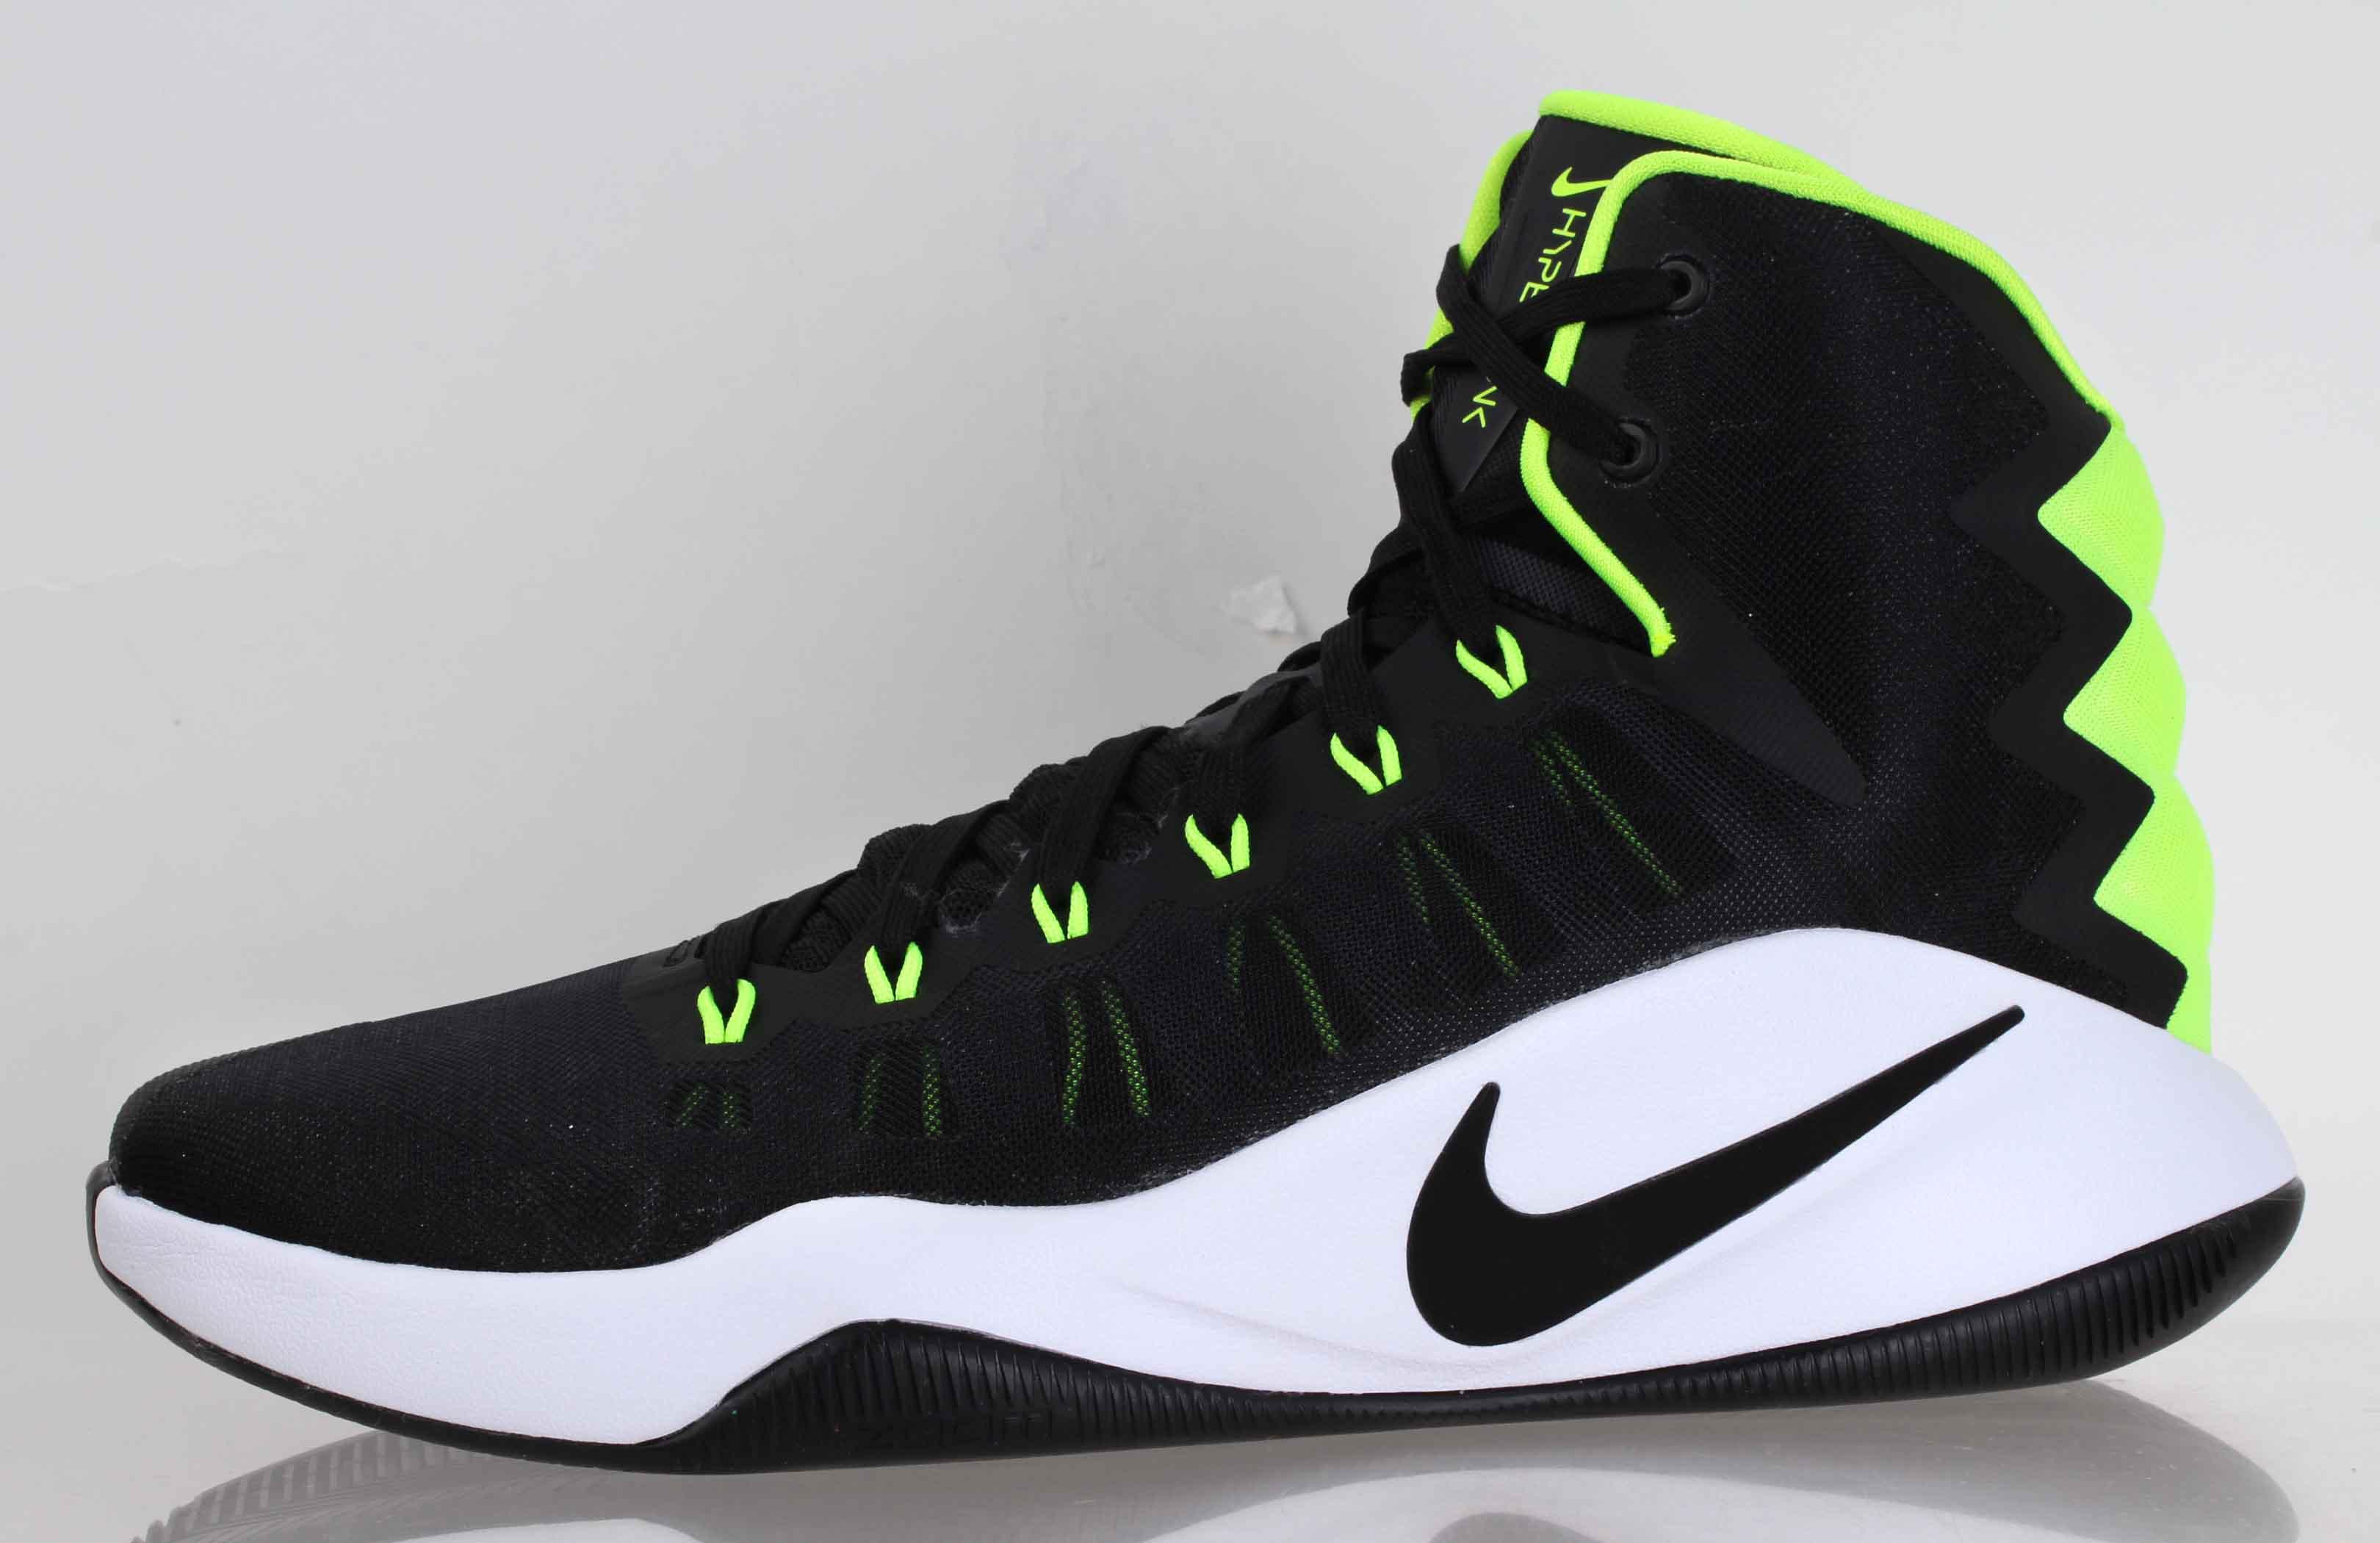 Nike Men's Basketball Shoes Hyperdunk 2016 Size 11 US  844359-007 Black Volt